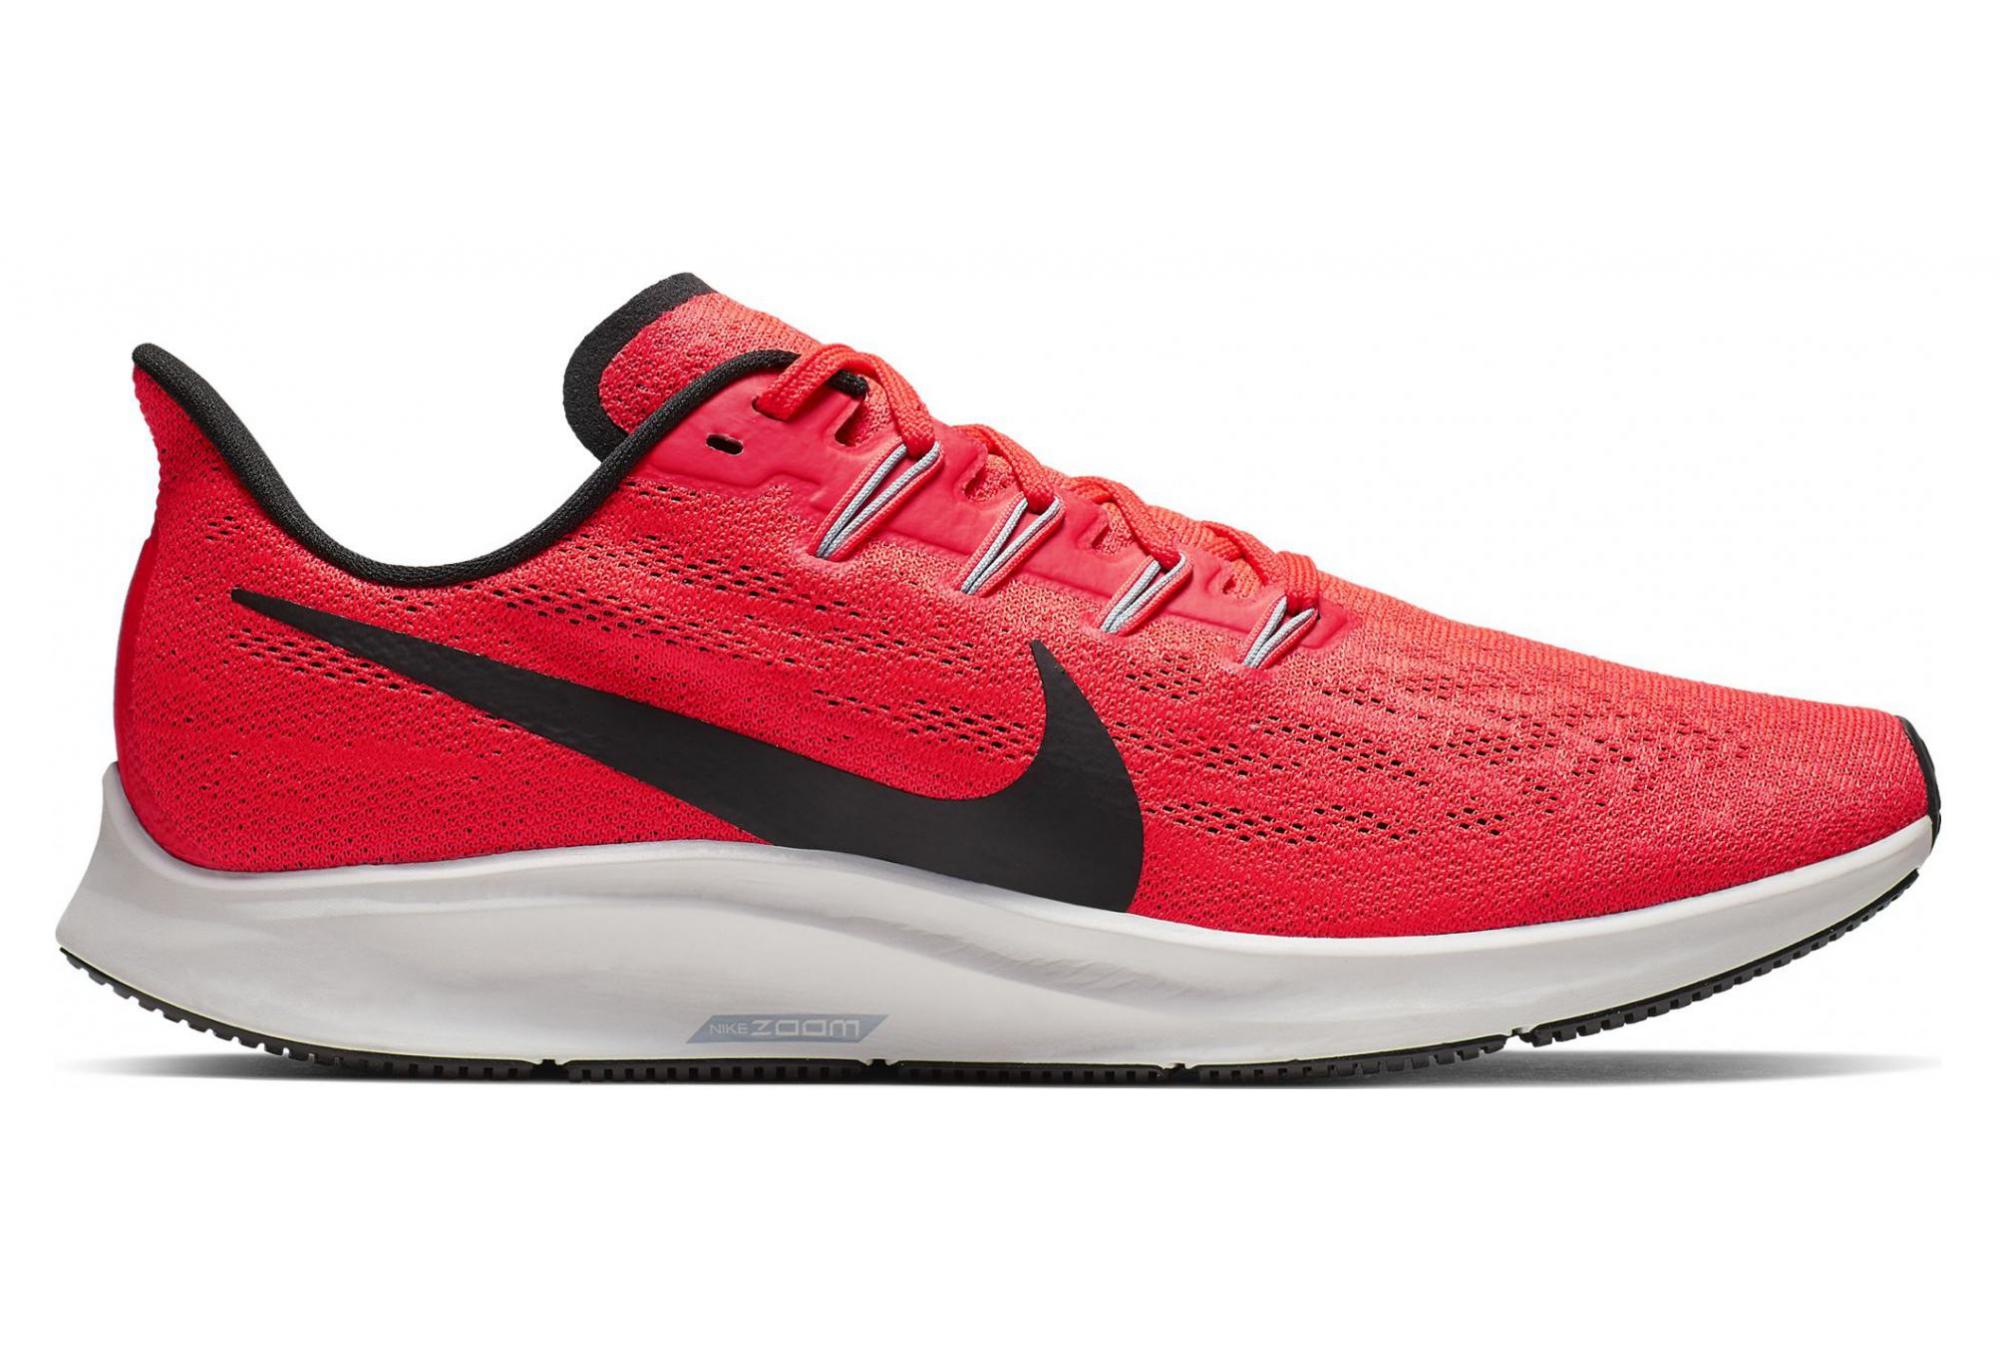 chaussures running nike noir et rouge